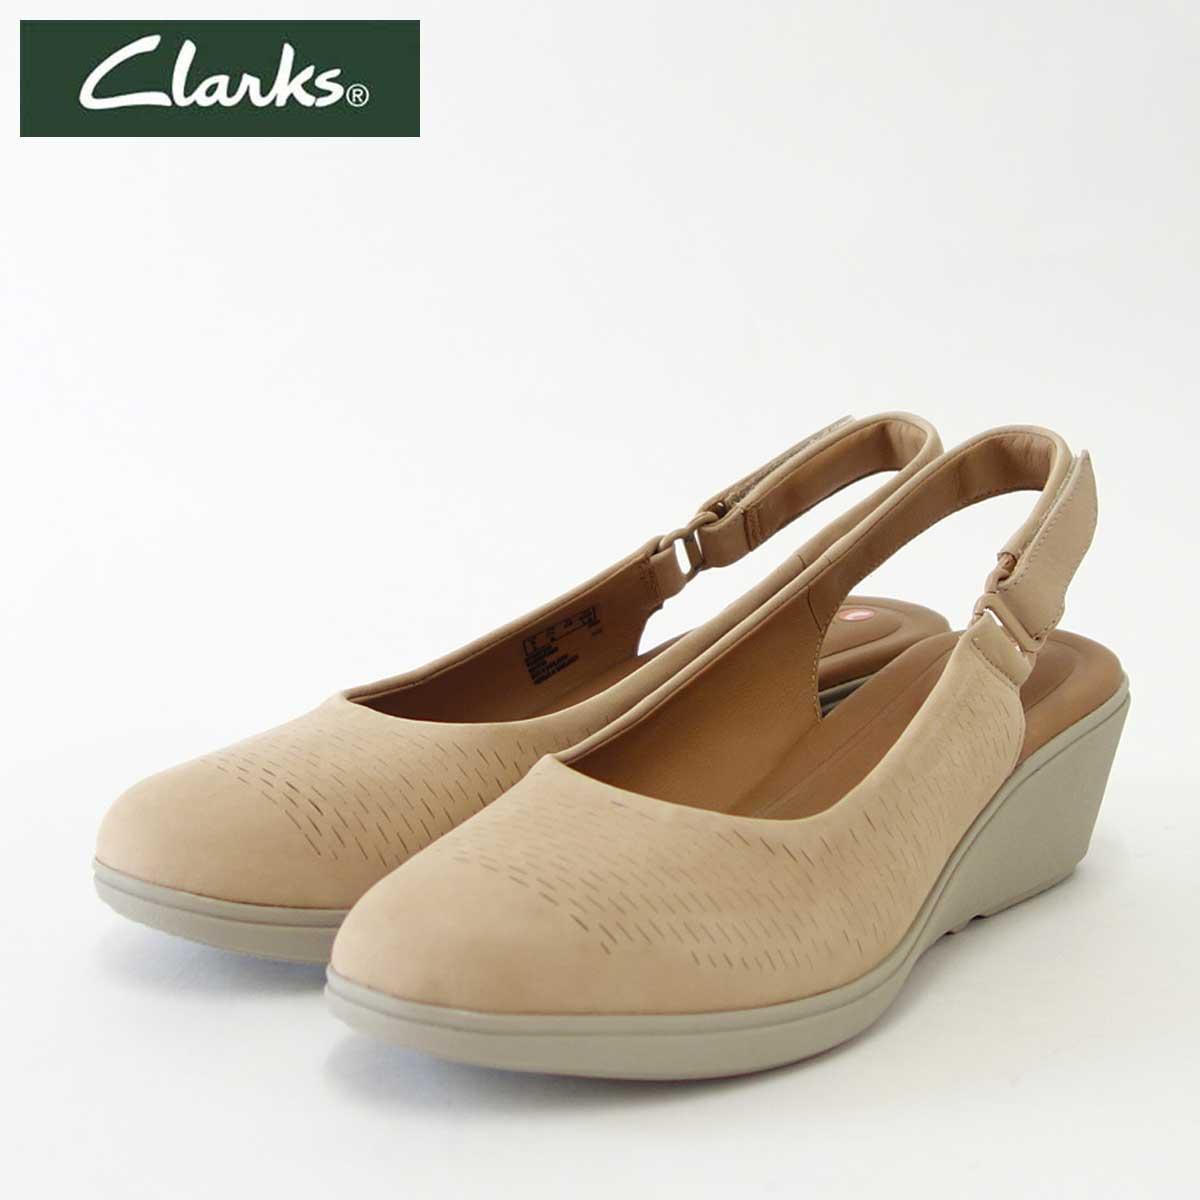 Clarks クラークス UnTallara Raeアンタララリー(レディース)サンドヌバック 26132381 「靴」